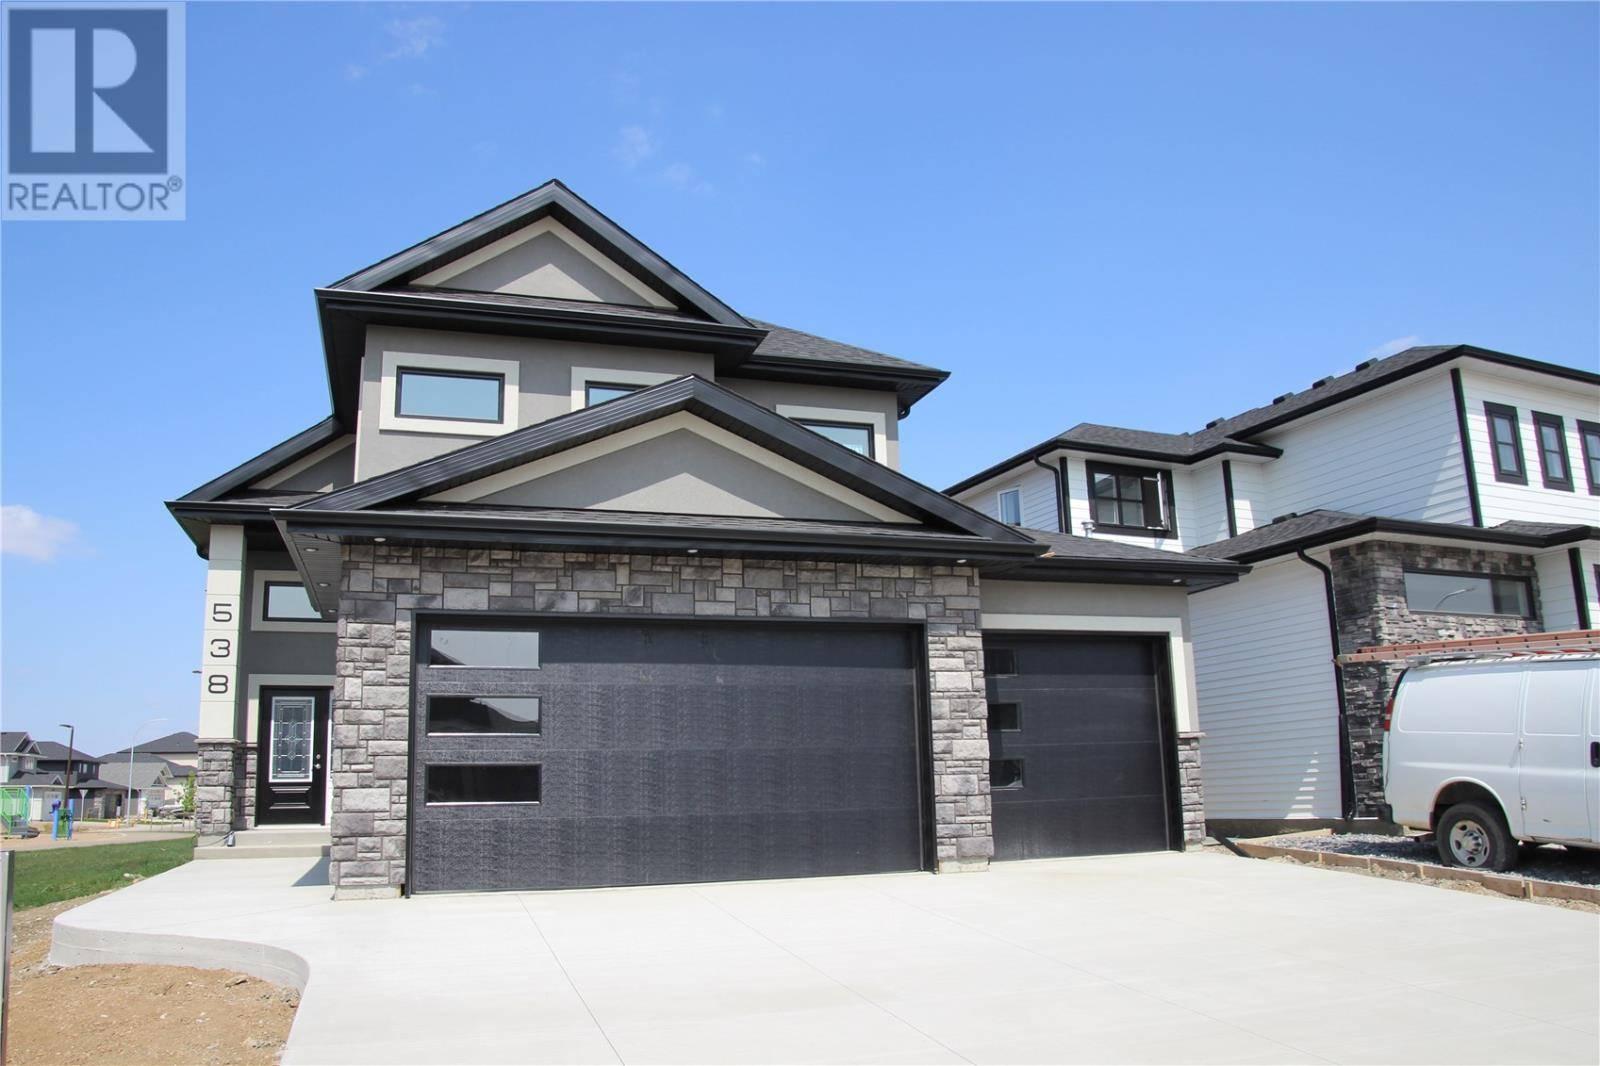 House for sale at 538 Bolstad Turn Saskatoon Saskatchewan - MLS: SK774505